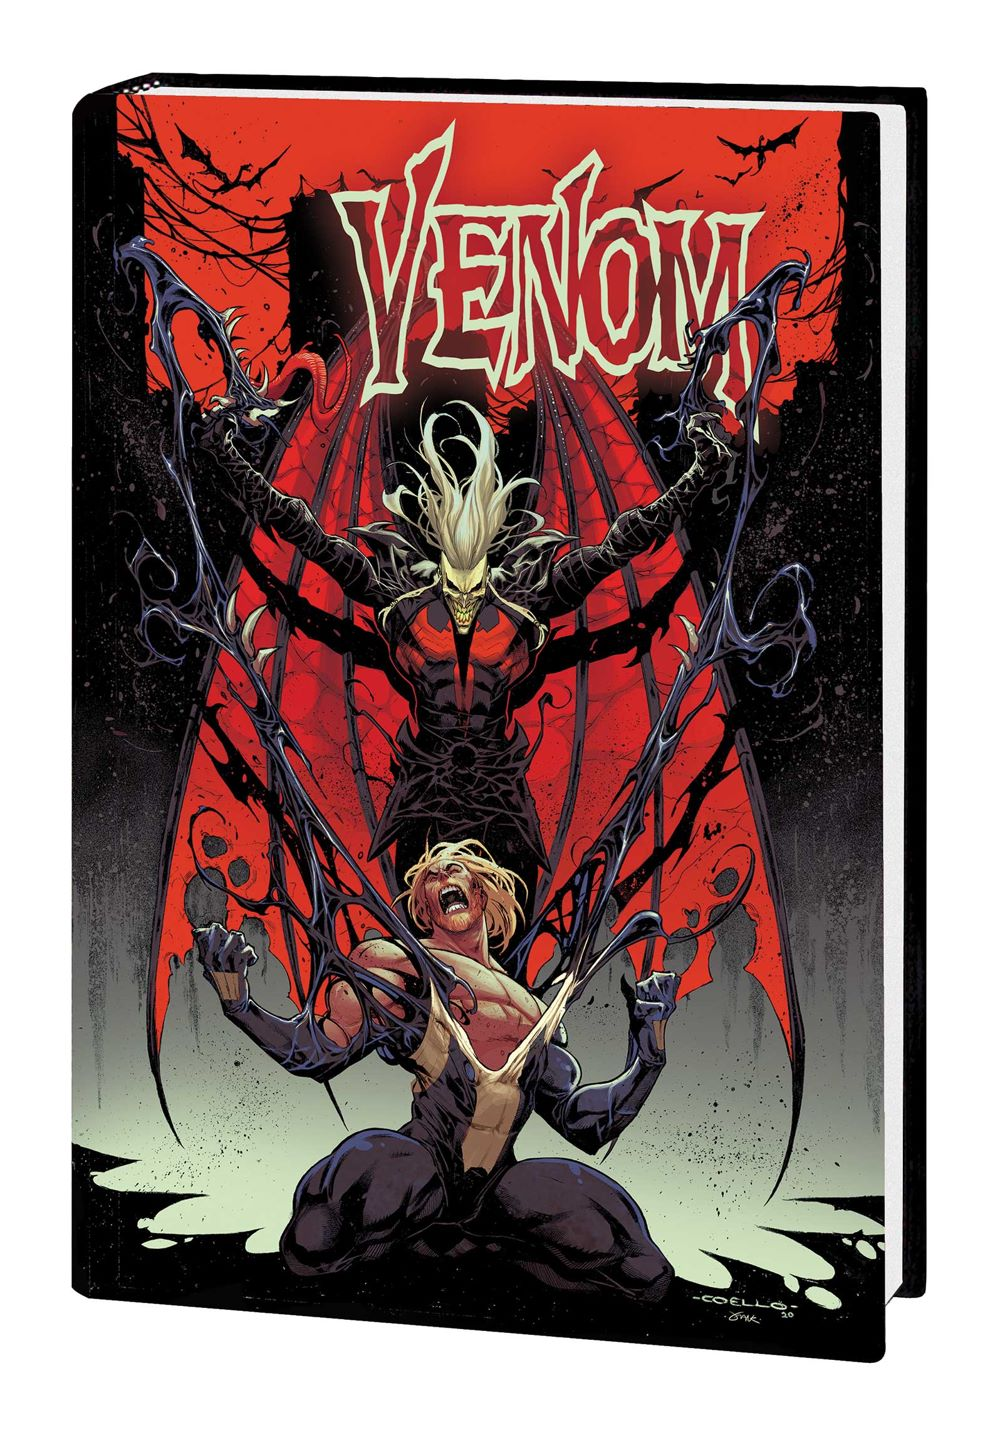 VENOM_DC_VOL_3_HC Marvel Comics August 2021 Solicitations